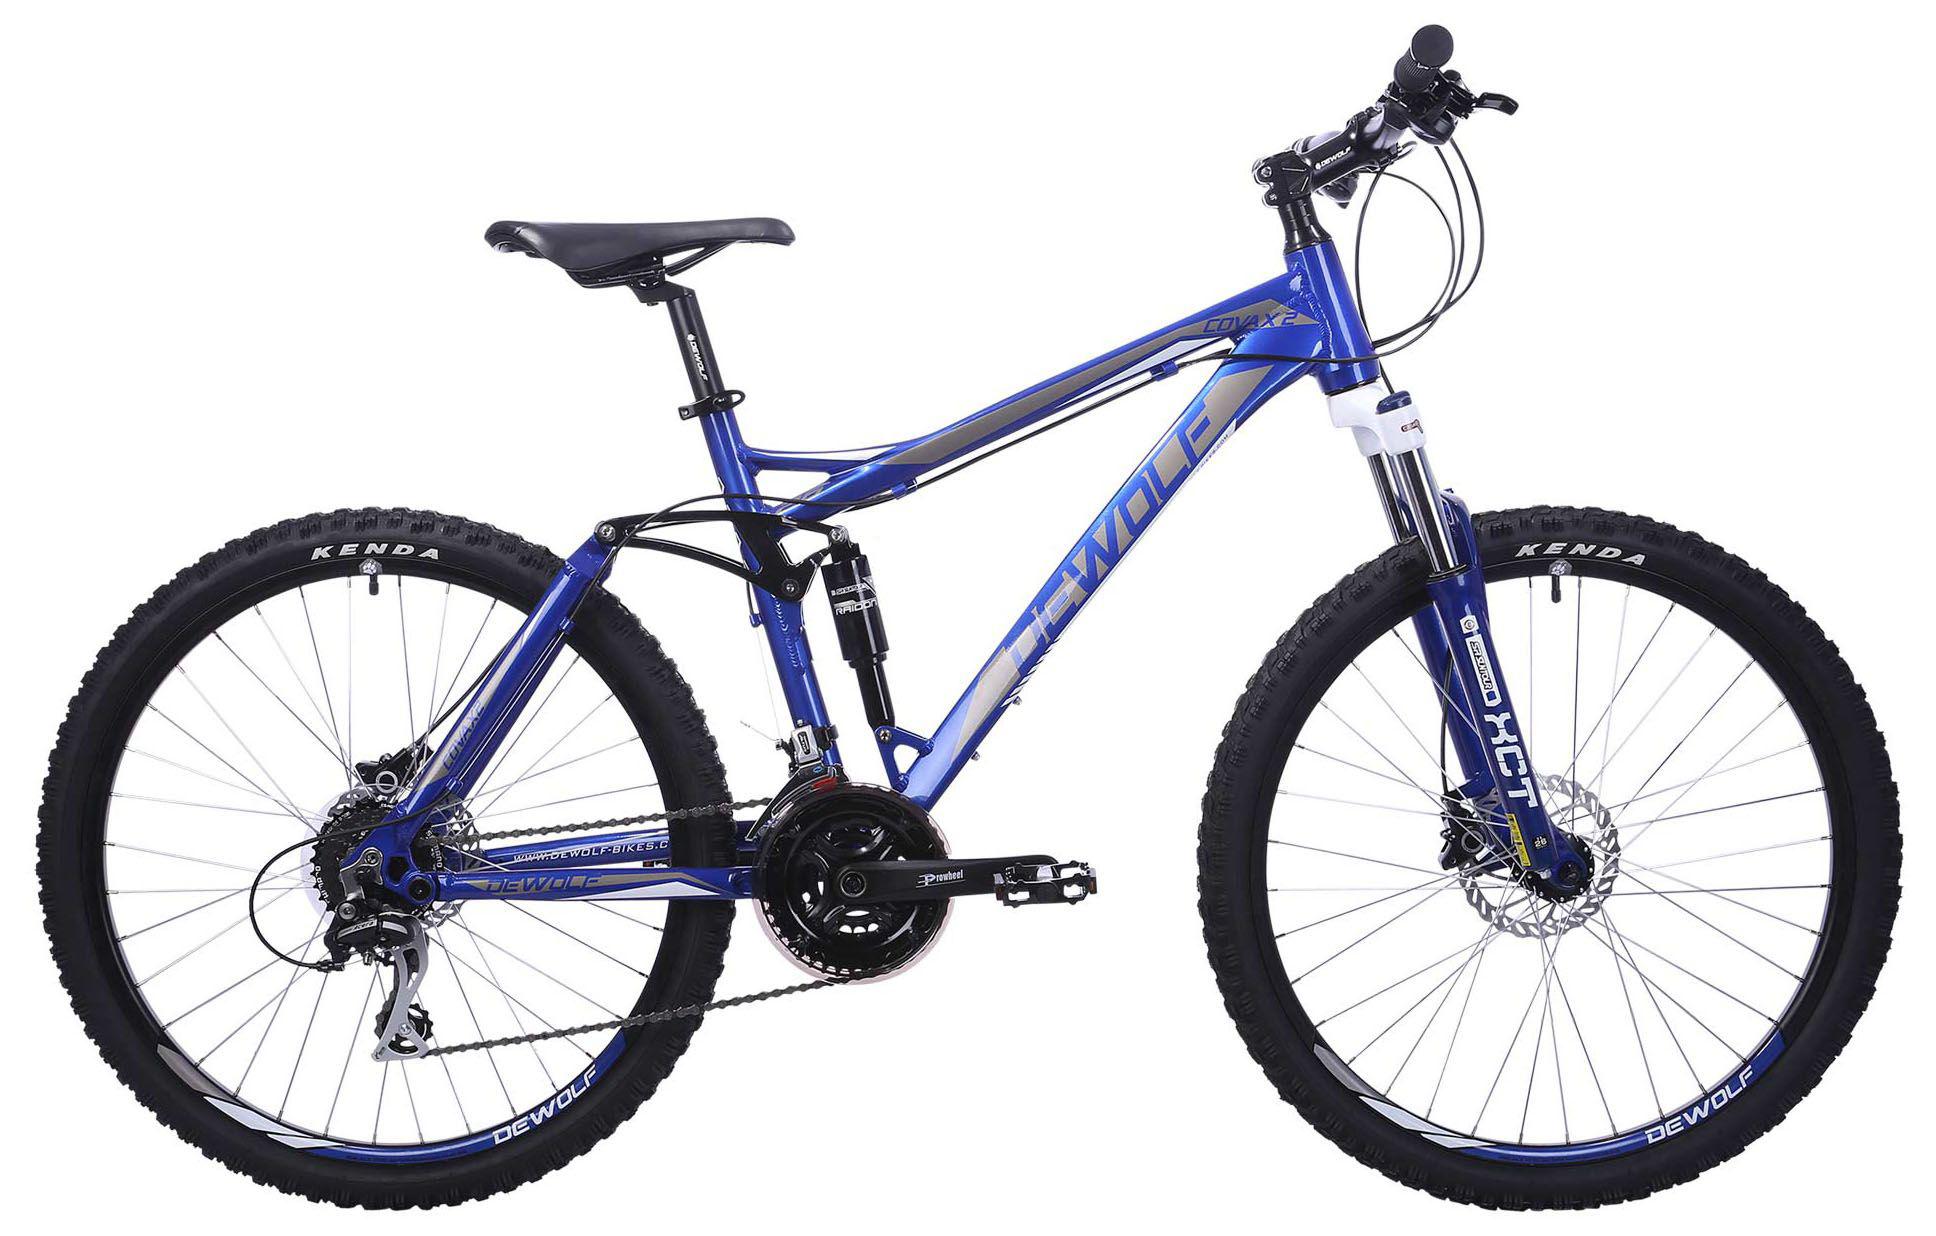 Велосипед Dewolf Covax 2 2018 велосипед dewolf wave 210 2018